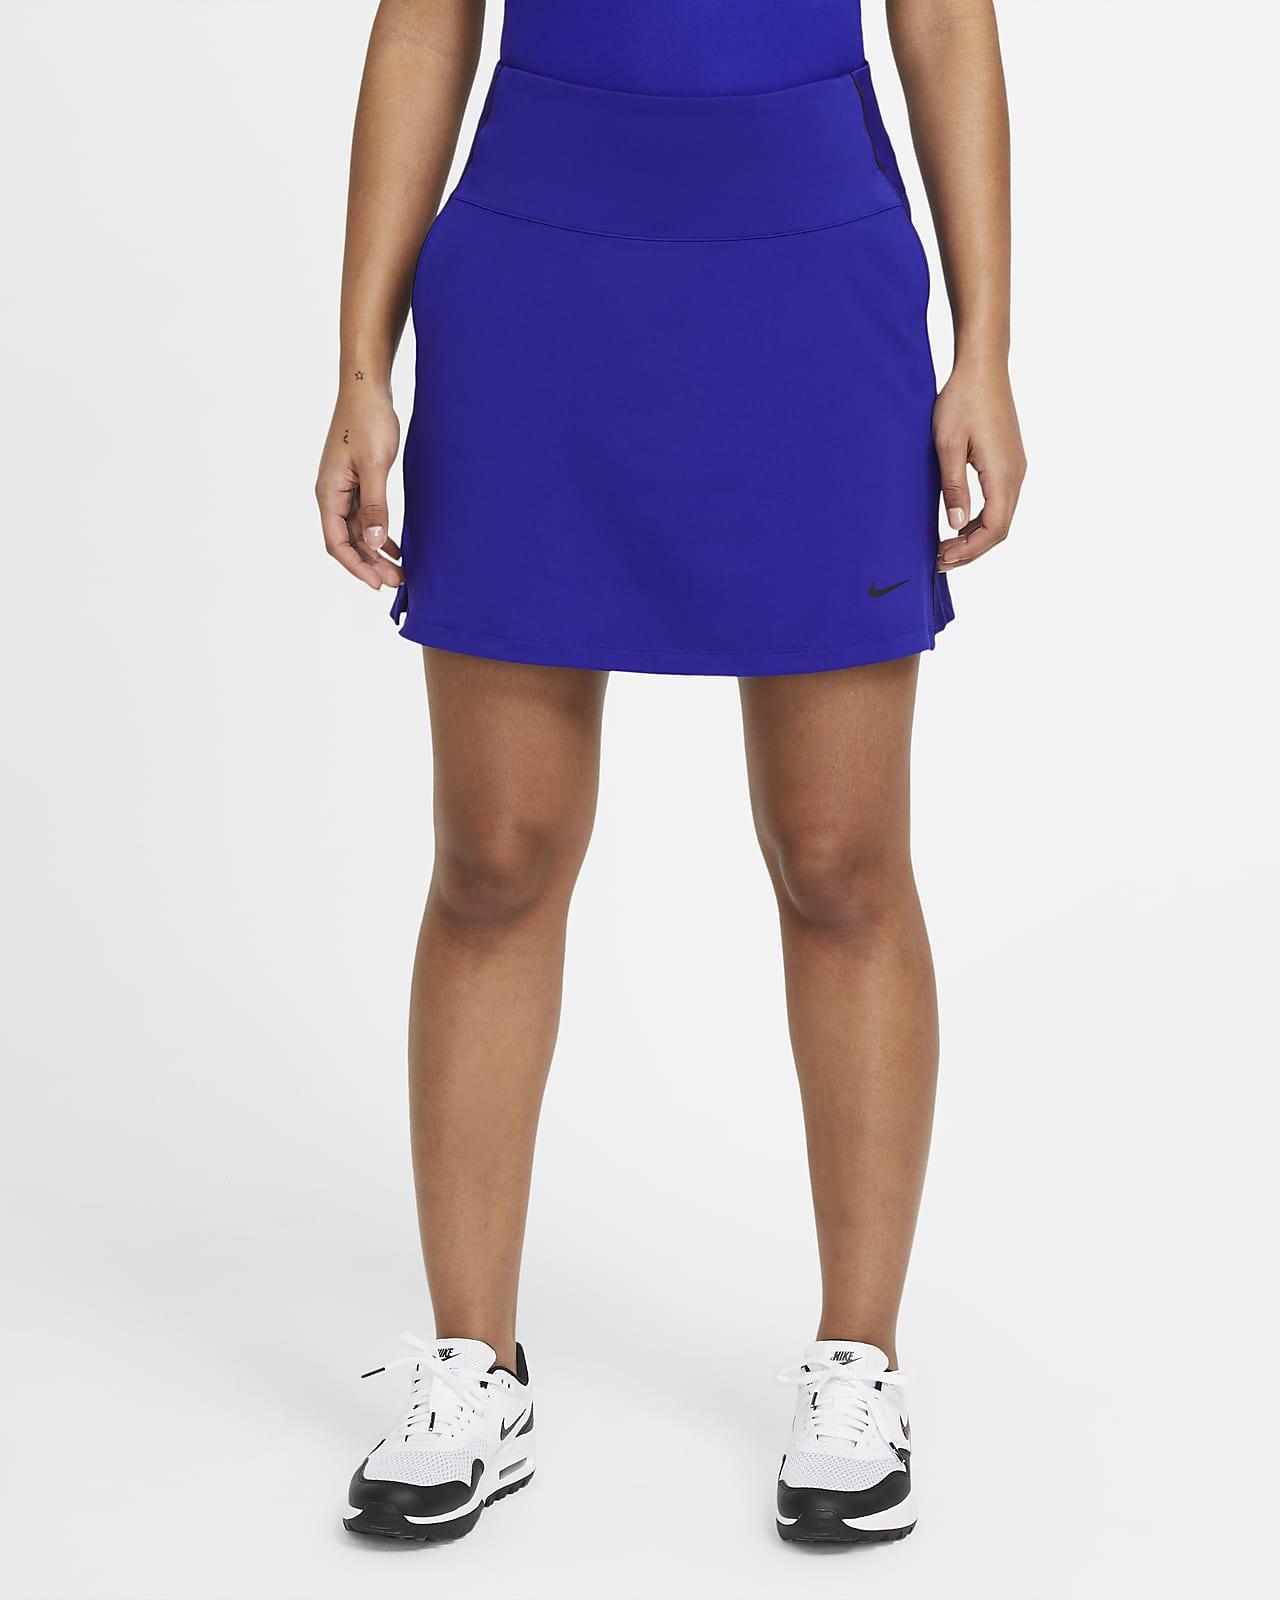 Falda de golf para mujer Nike Dri-FIT UV Victory